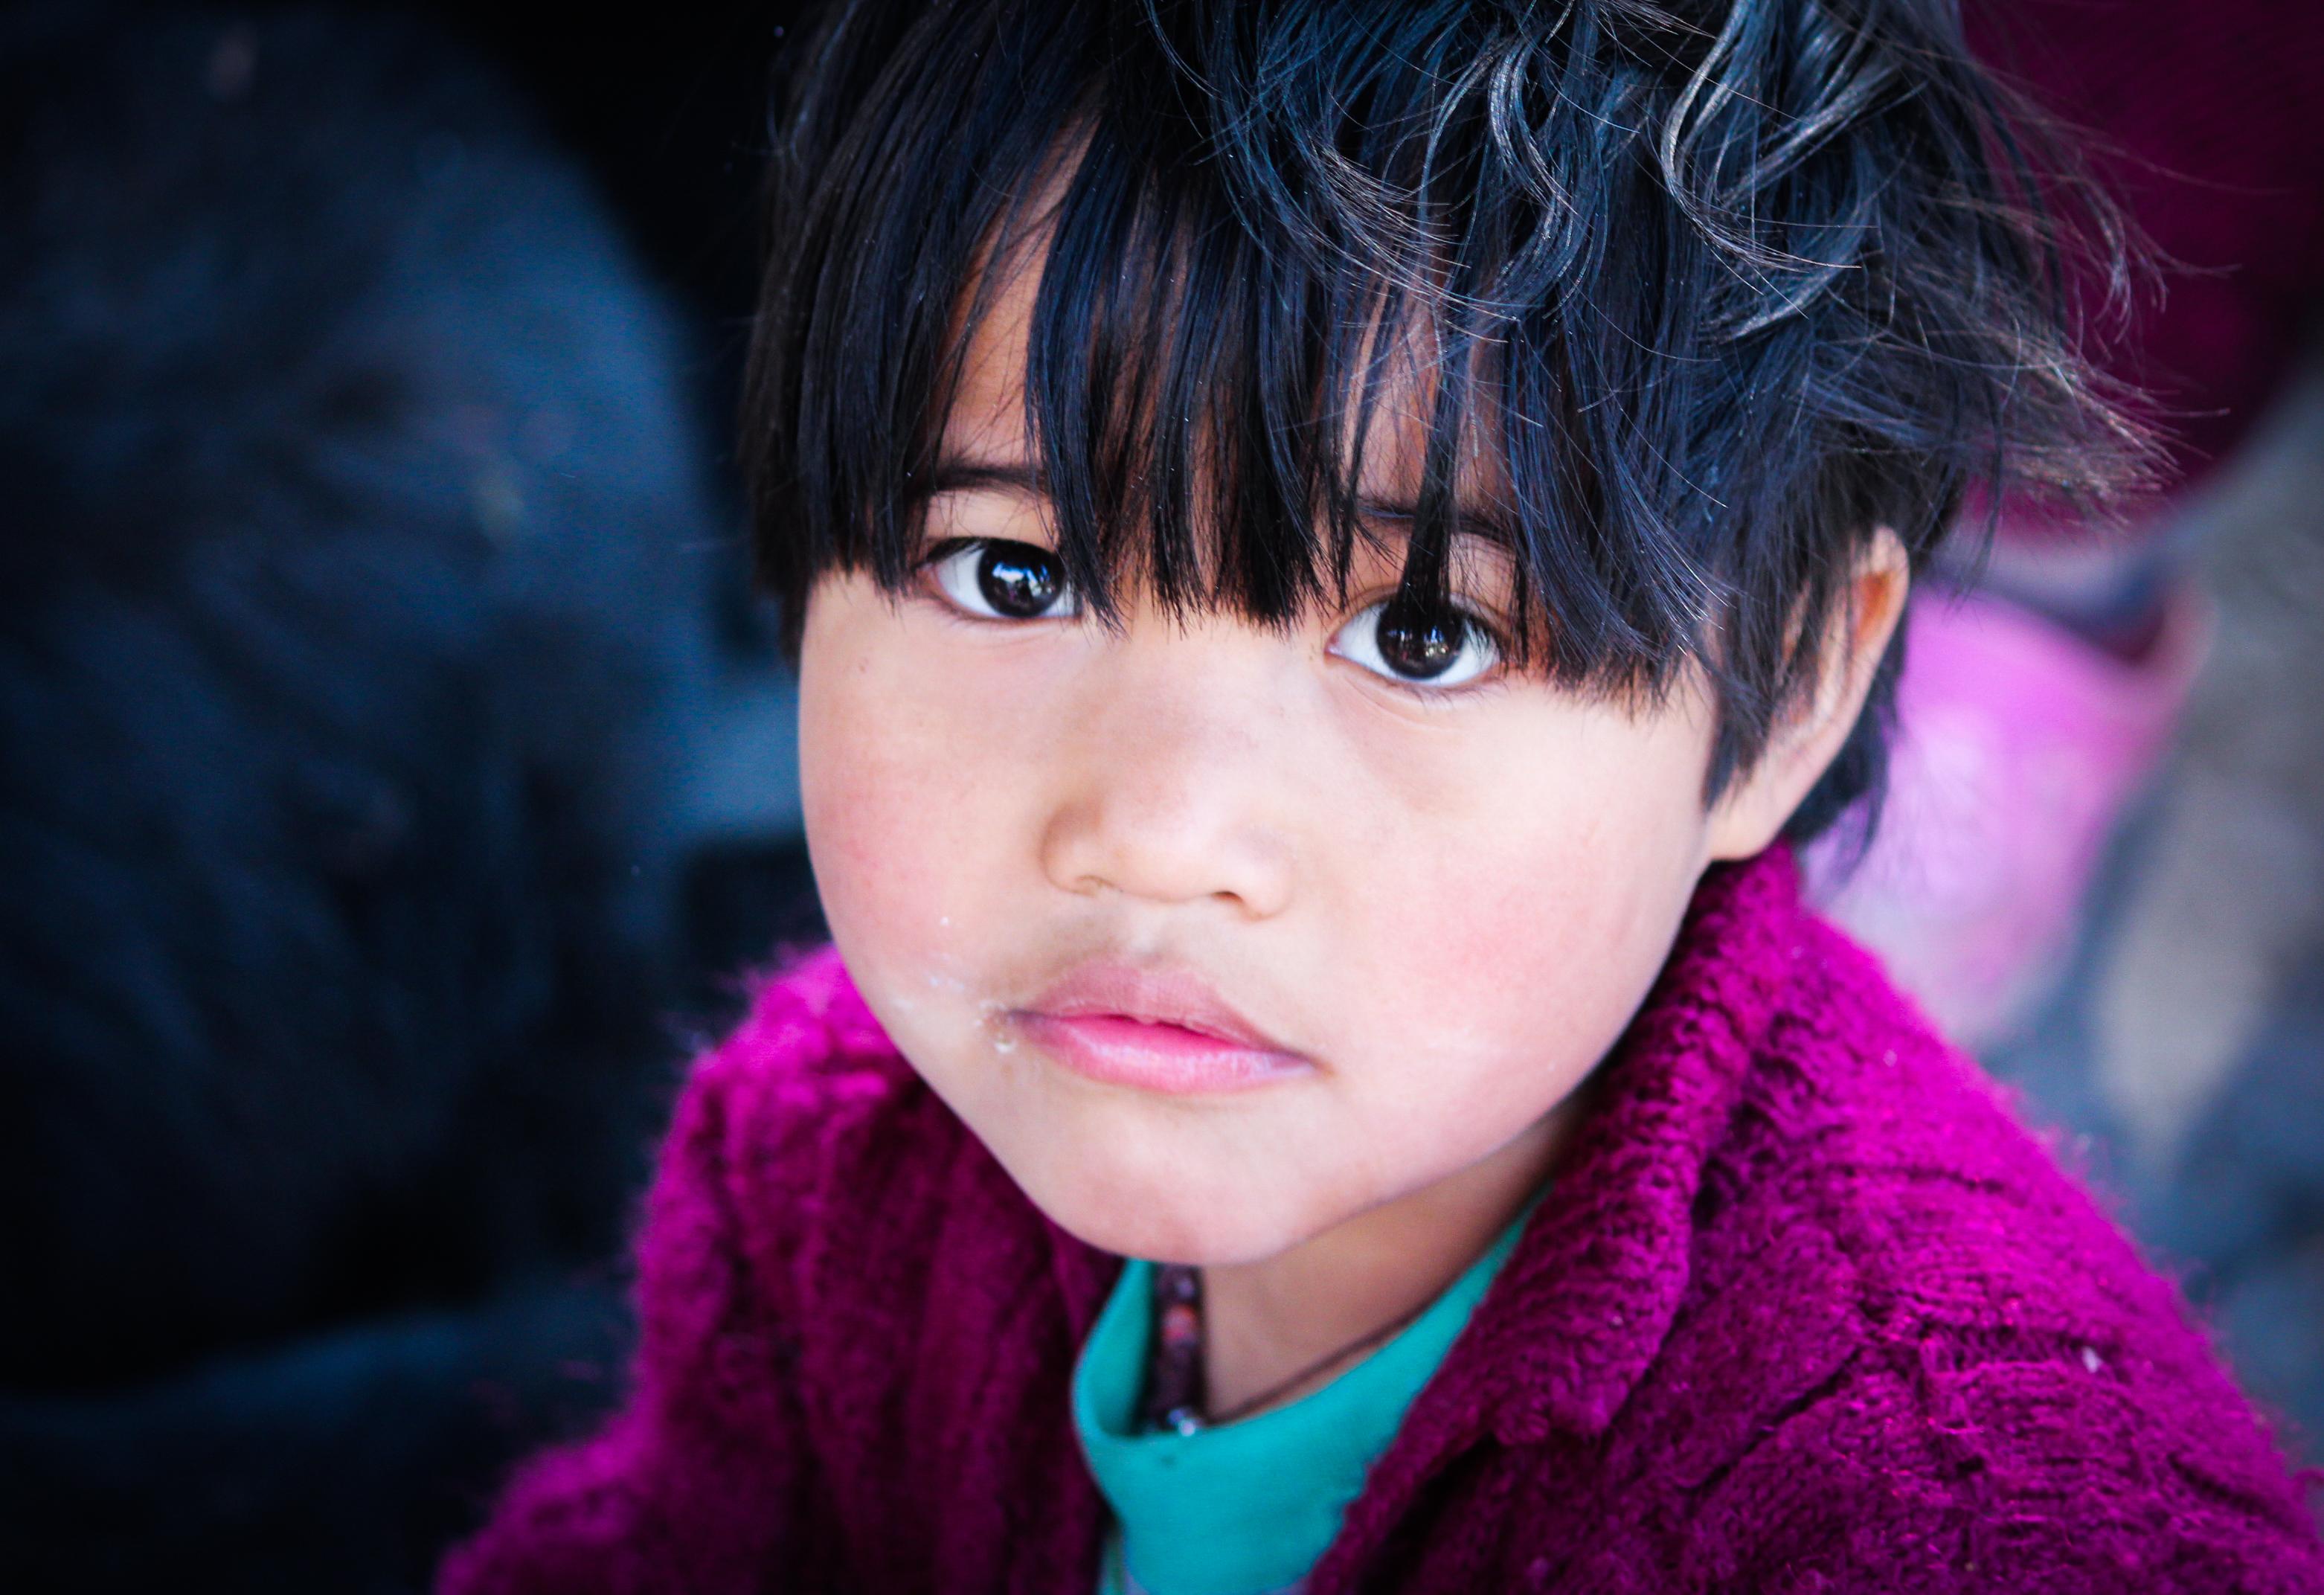 Eyes of Innocence in India